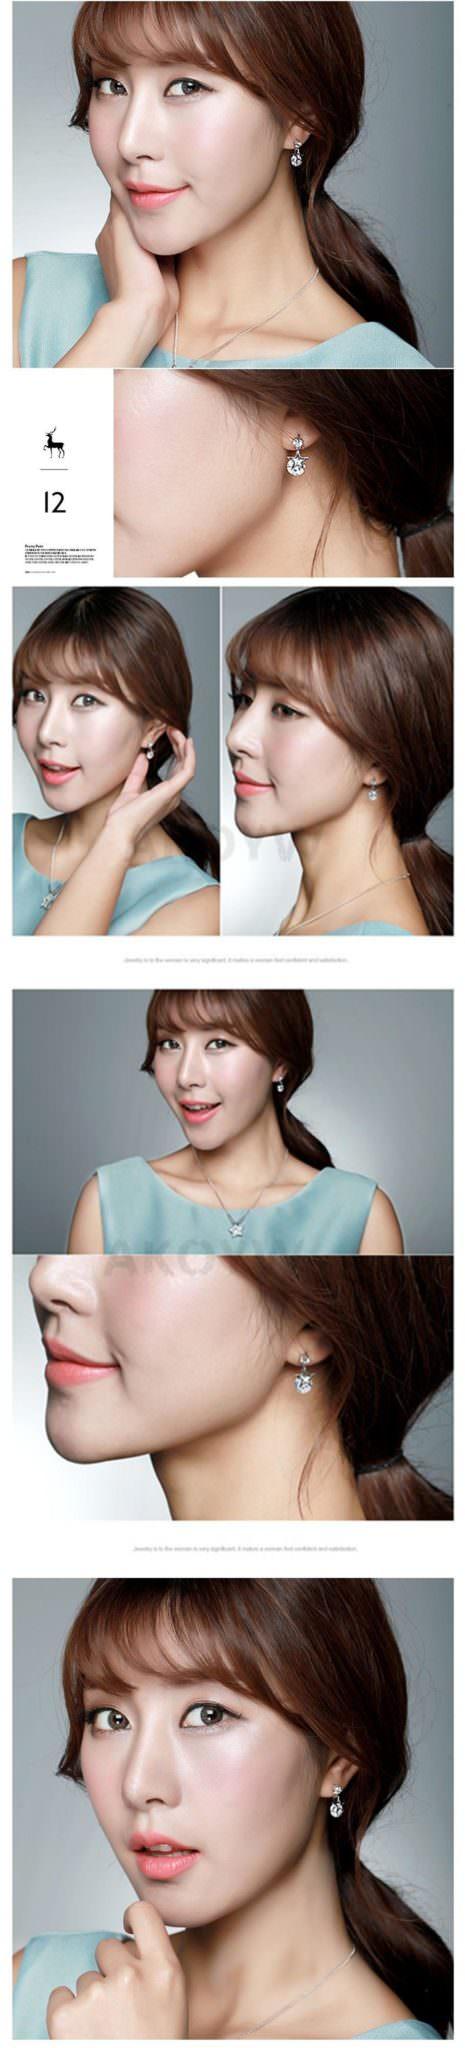 11578-7034838955dda1d172e21dd97f1e03f1 2016 Ms Crystal Pentagram Cubic Zirconia Fashion Jewelry Earrings